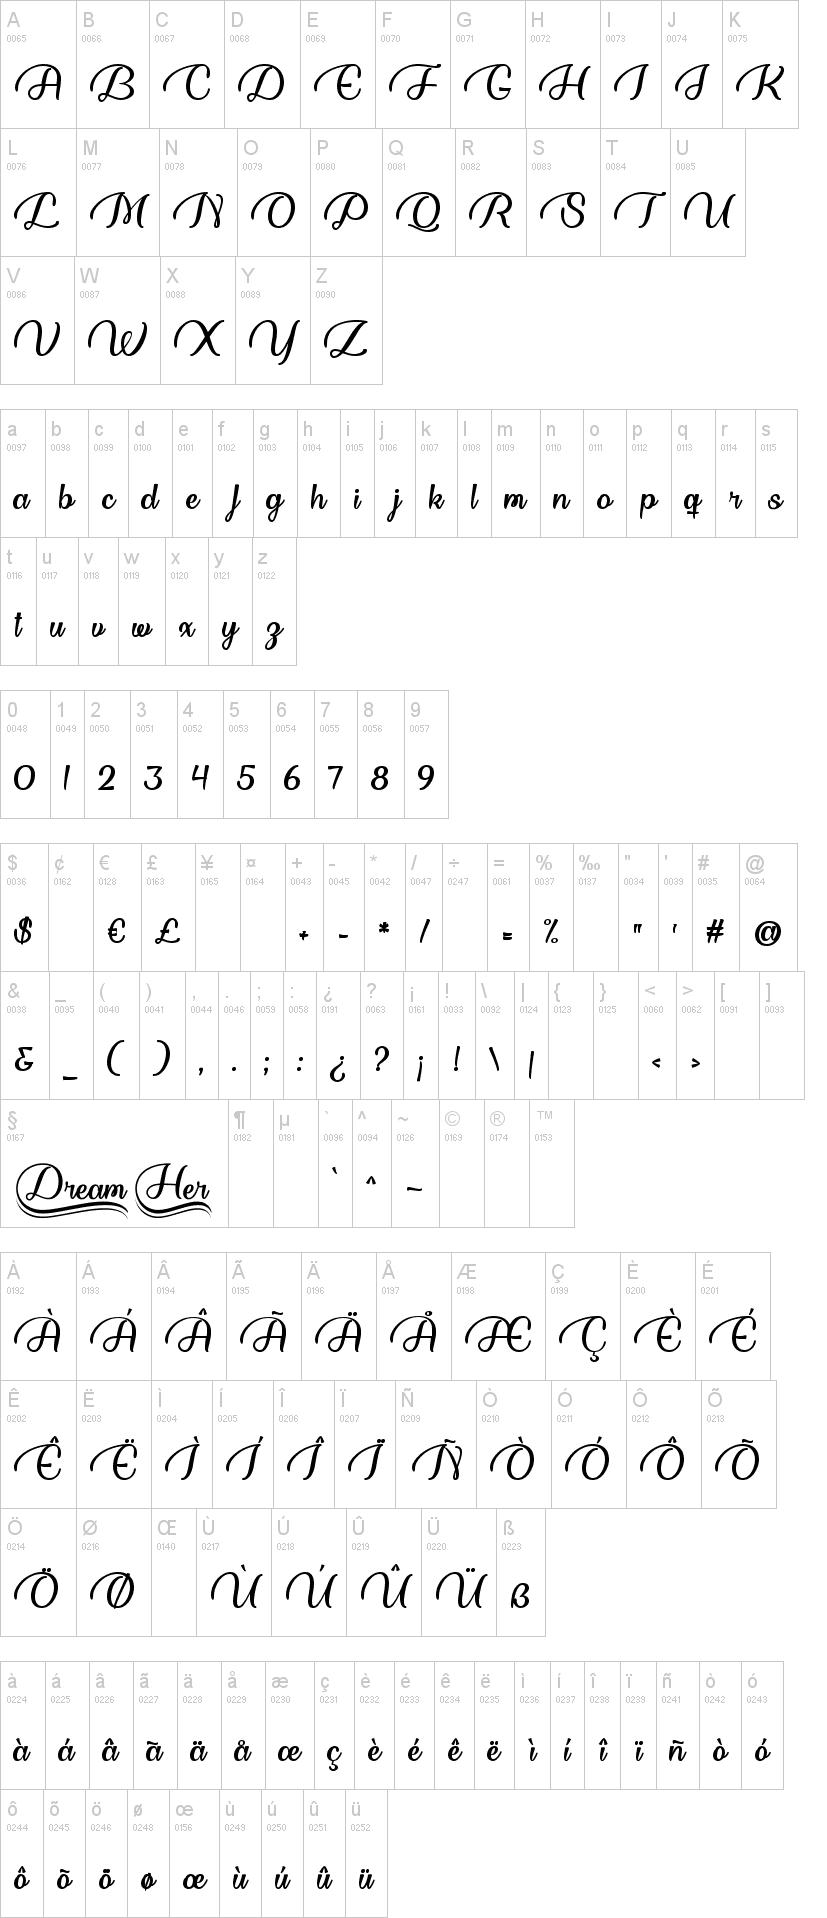 Dream Her Font-1